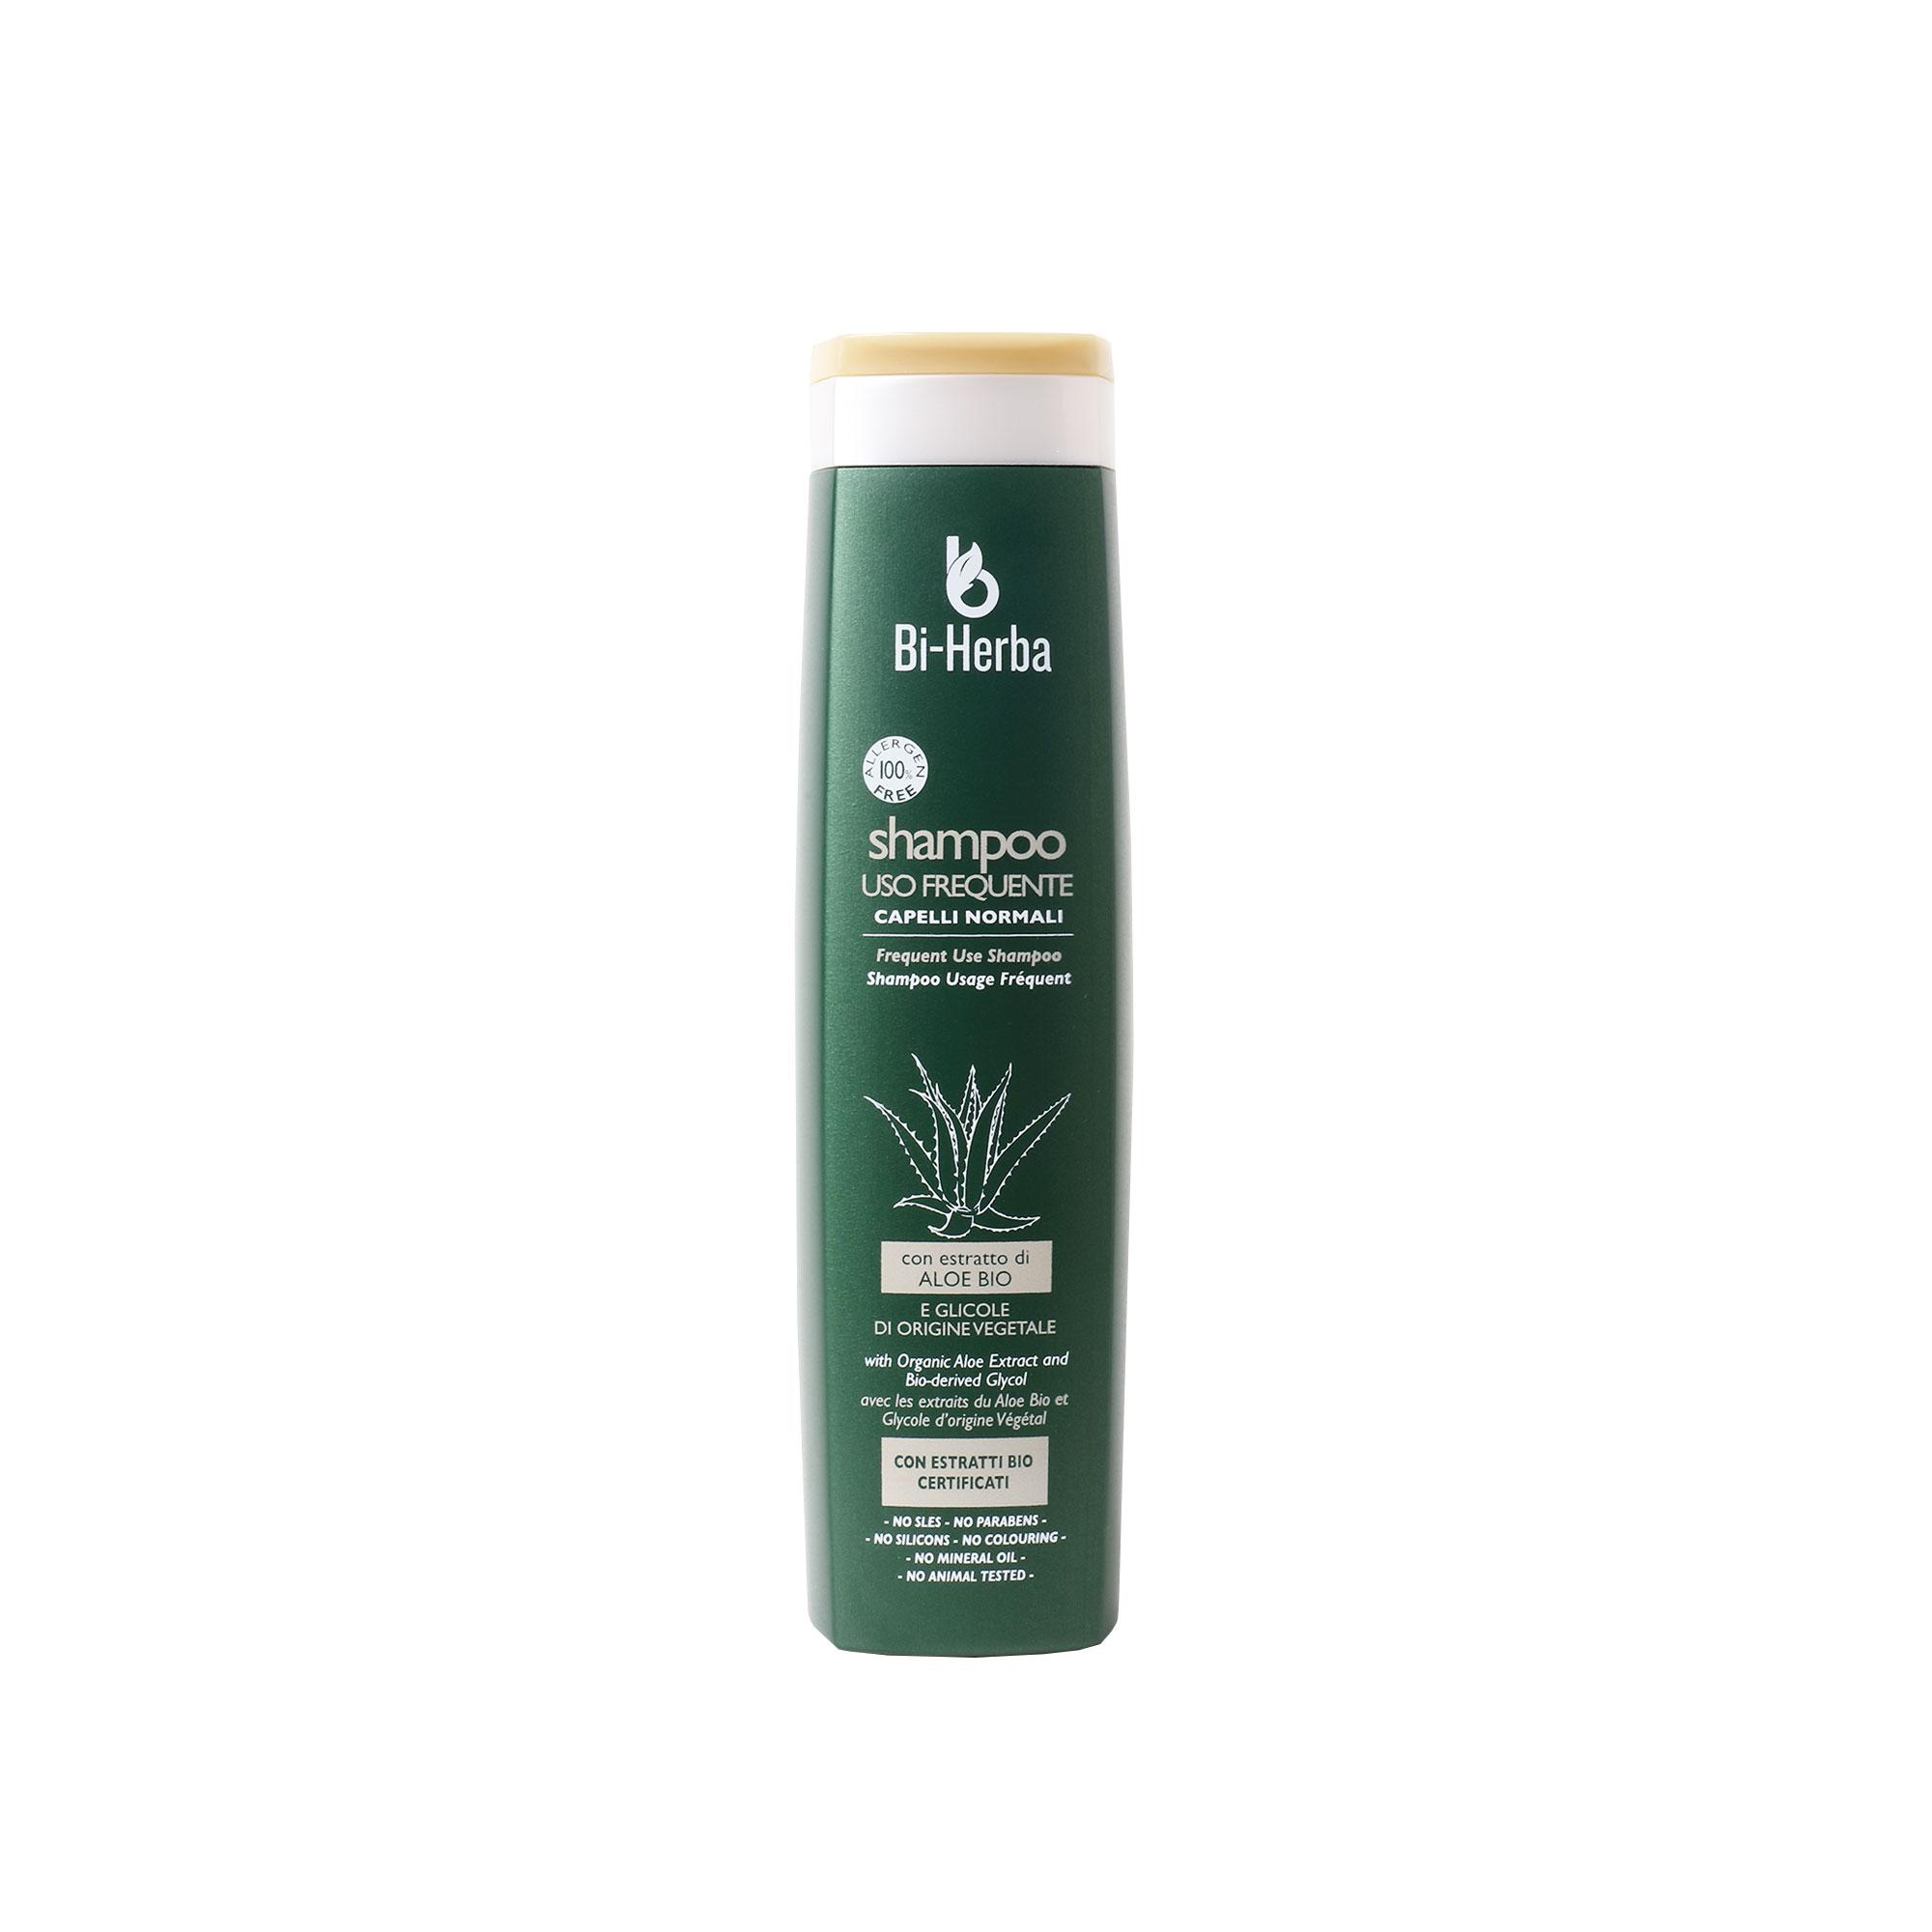 Shampoo – BiHerba